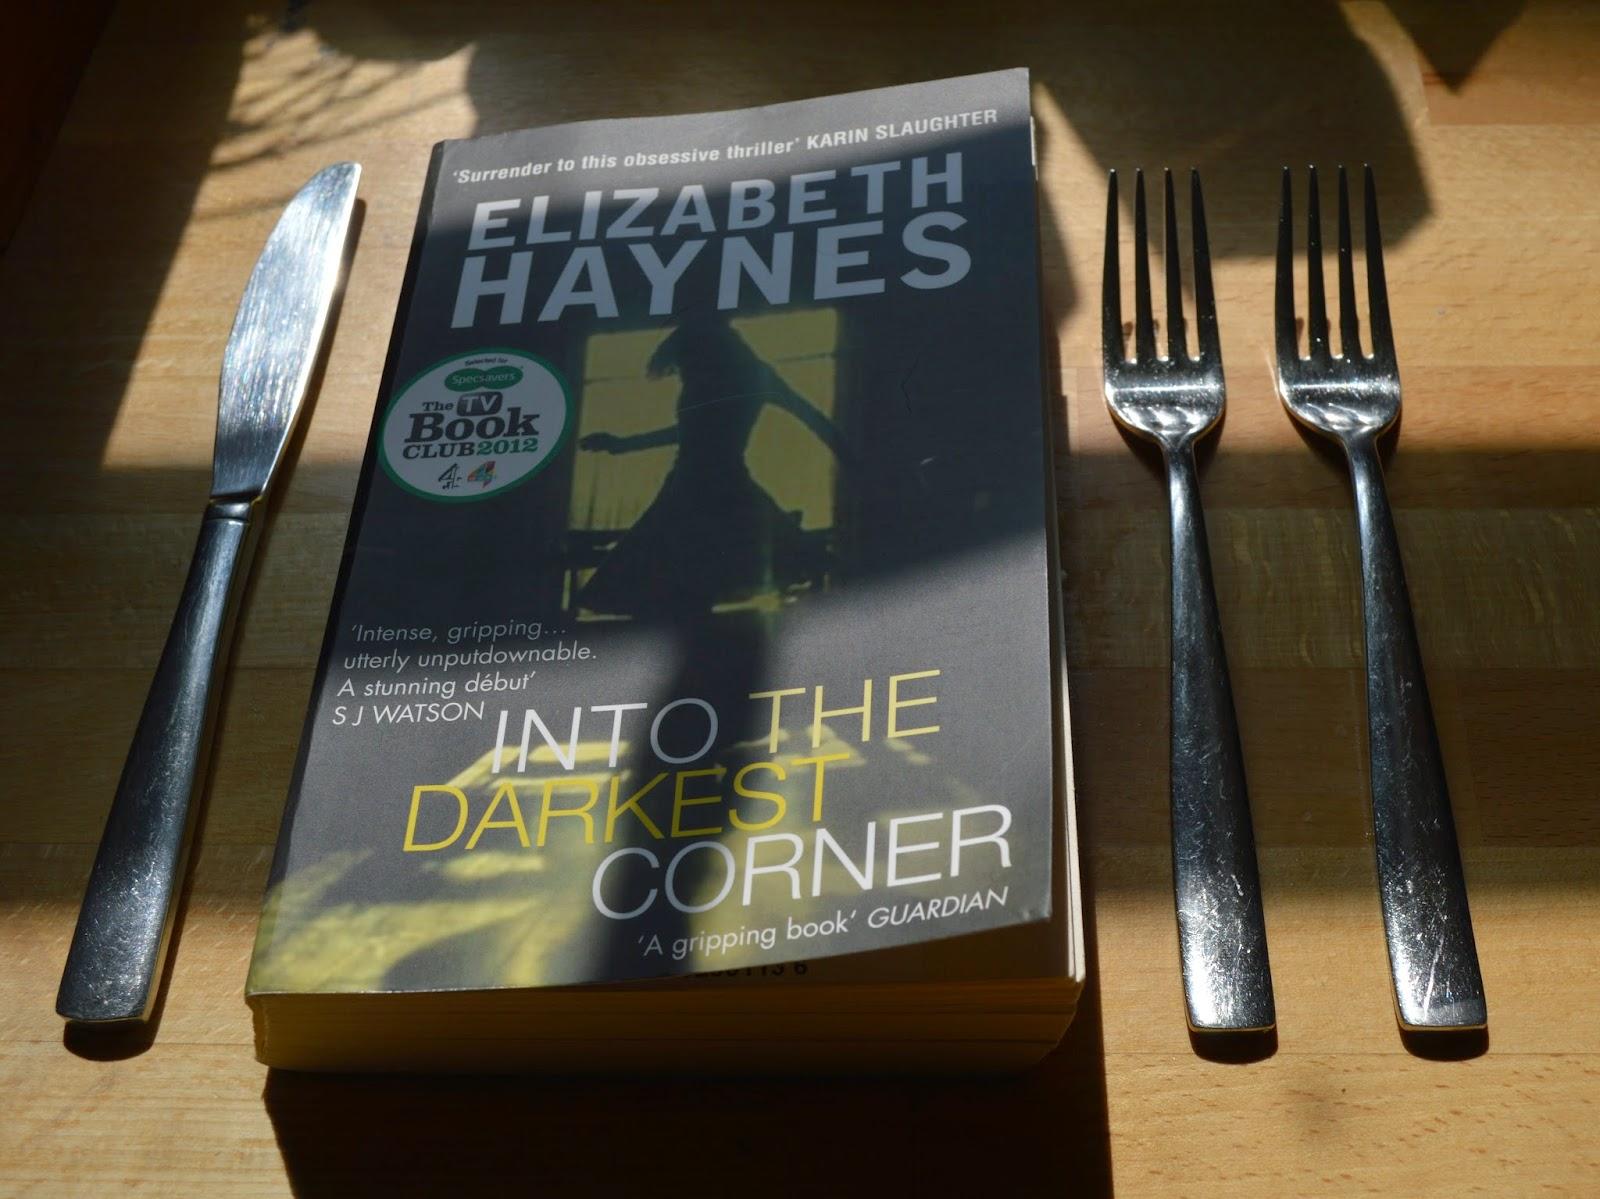 crime fiction, Into the Darkest Corner, photo, photograph, Elizabeth Haynes, paperback, review, ISBN: 9780956251572, Amazon Best Book 2011,